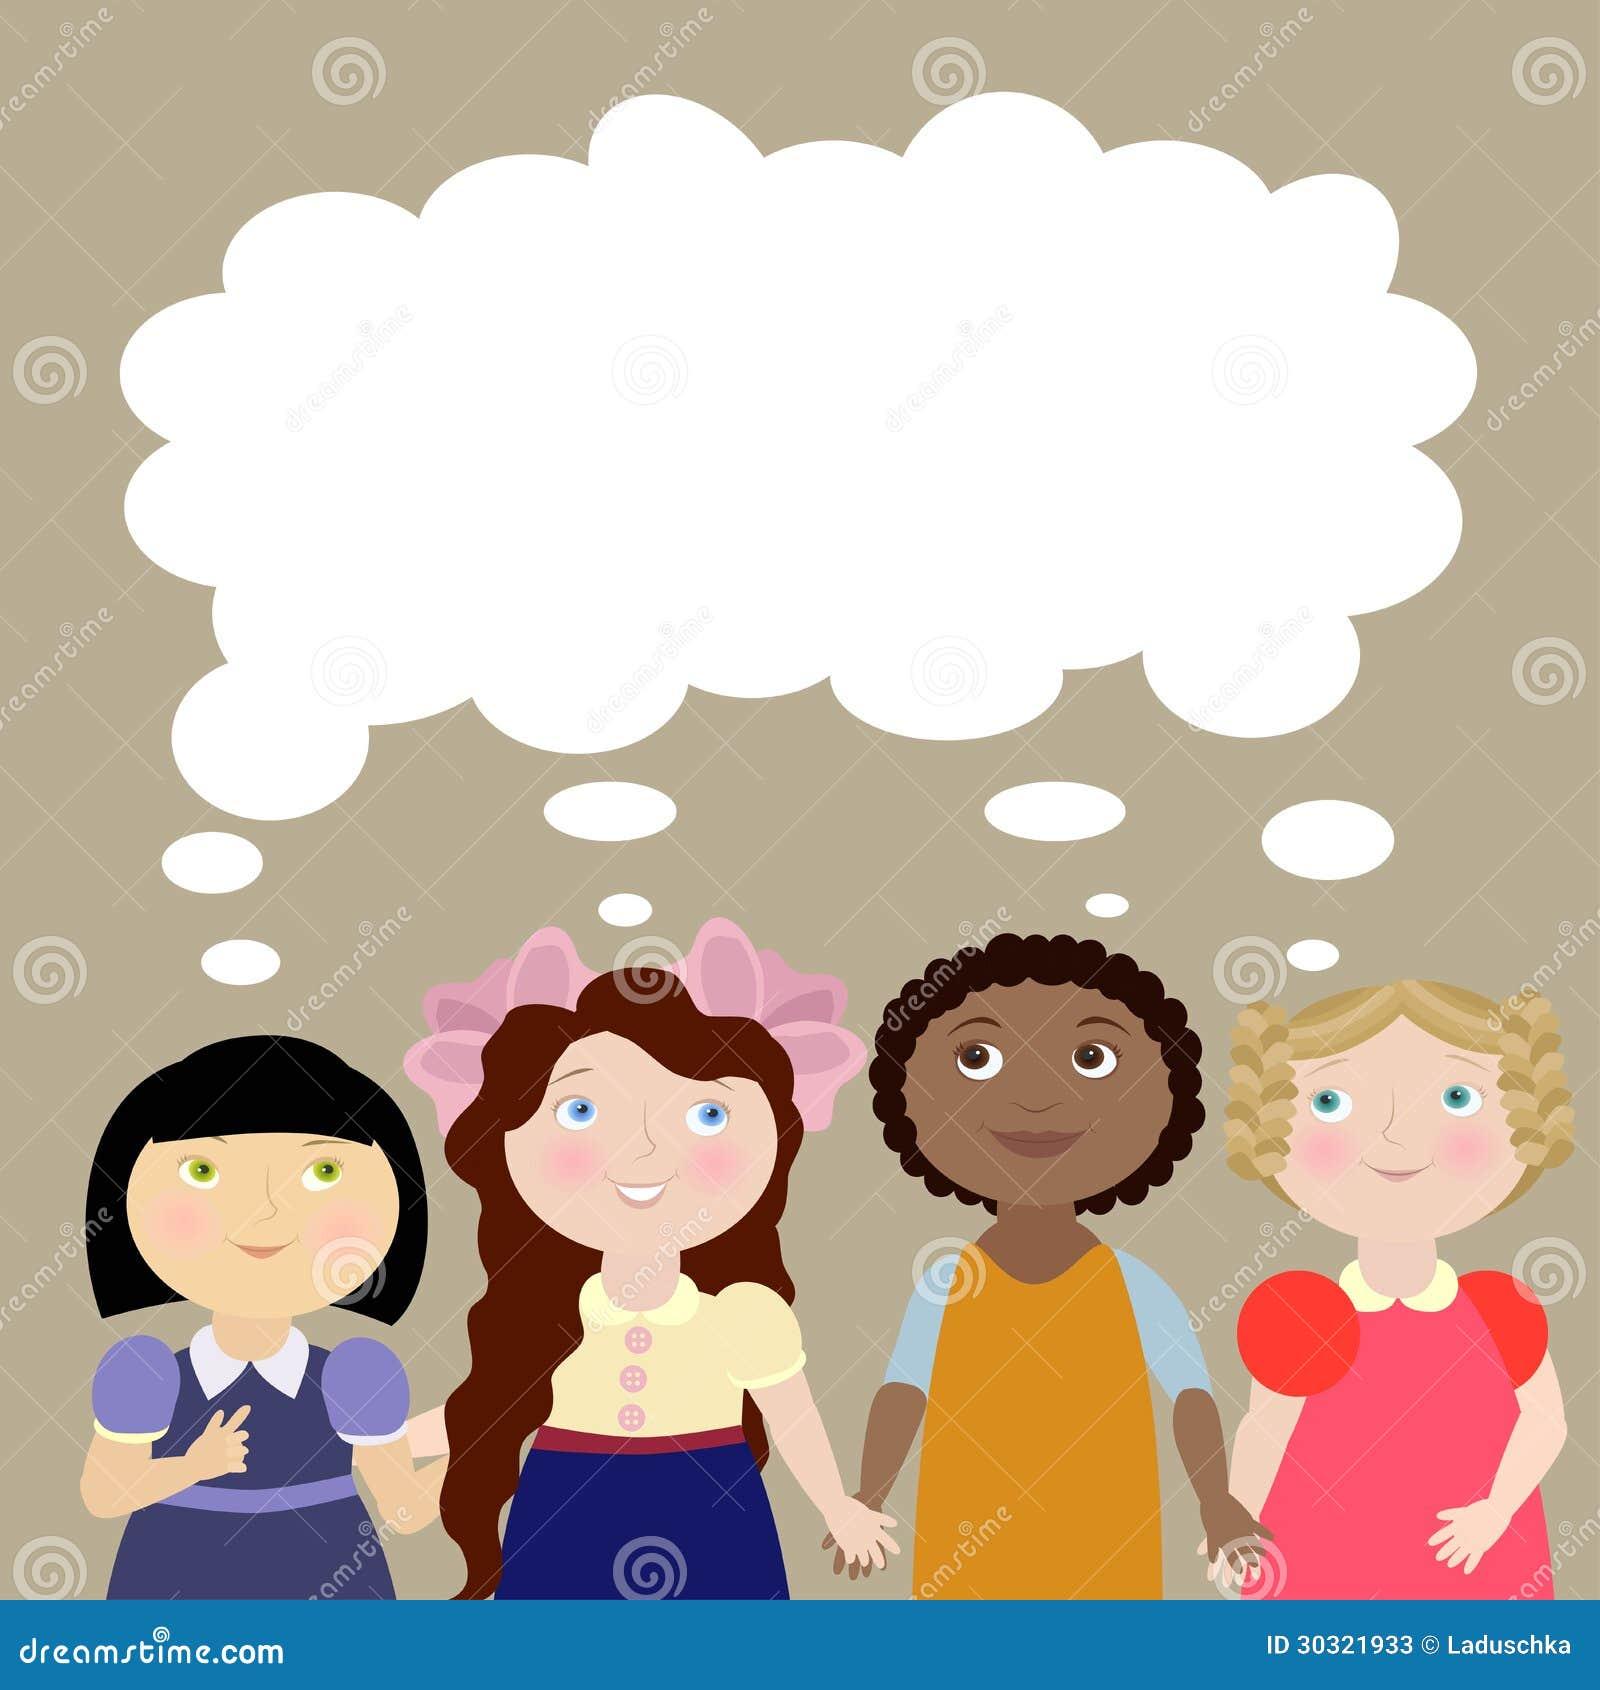 4 Girls With Thinking Bubble Stock Photos - Image: 30321933